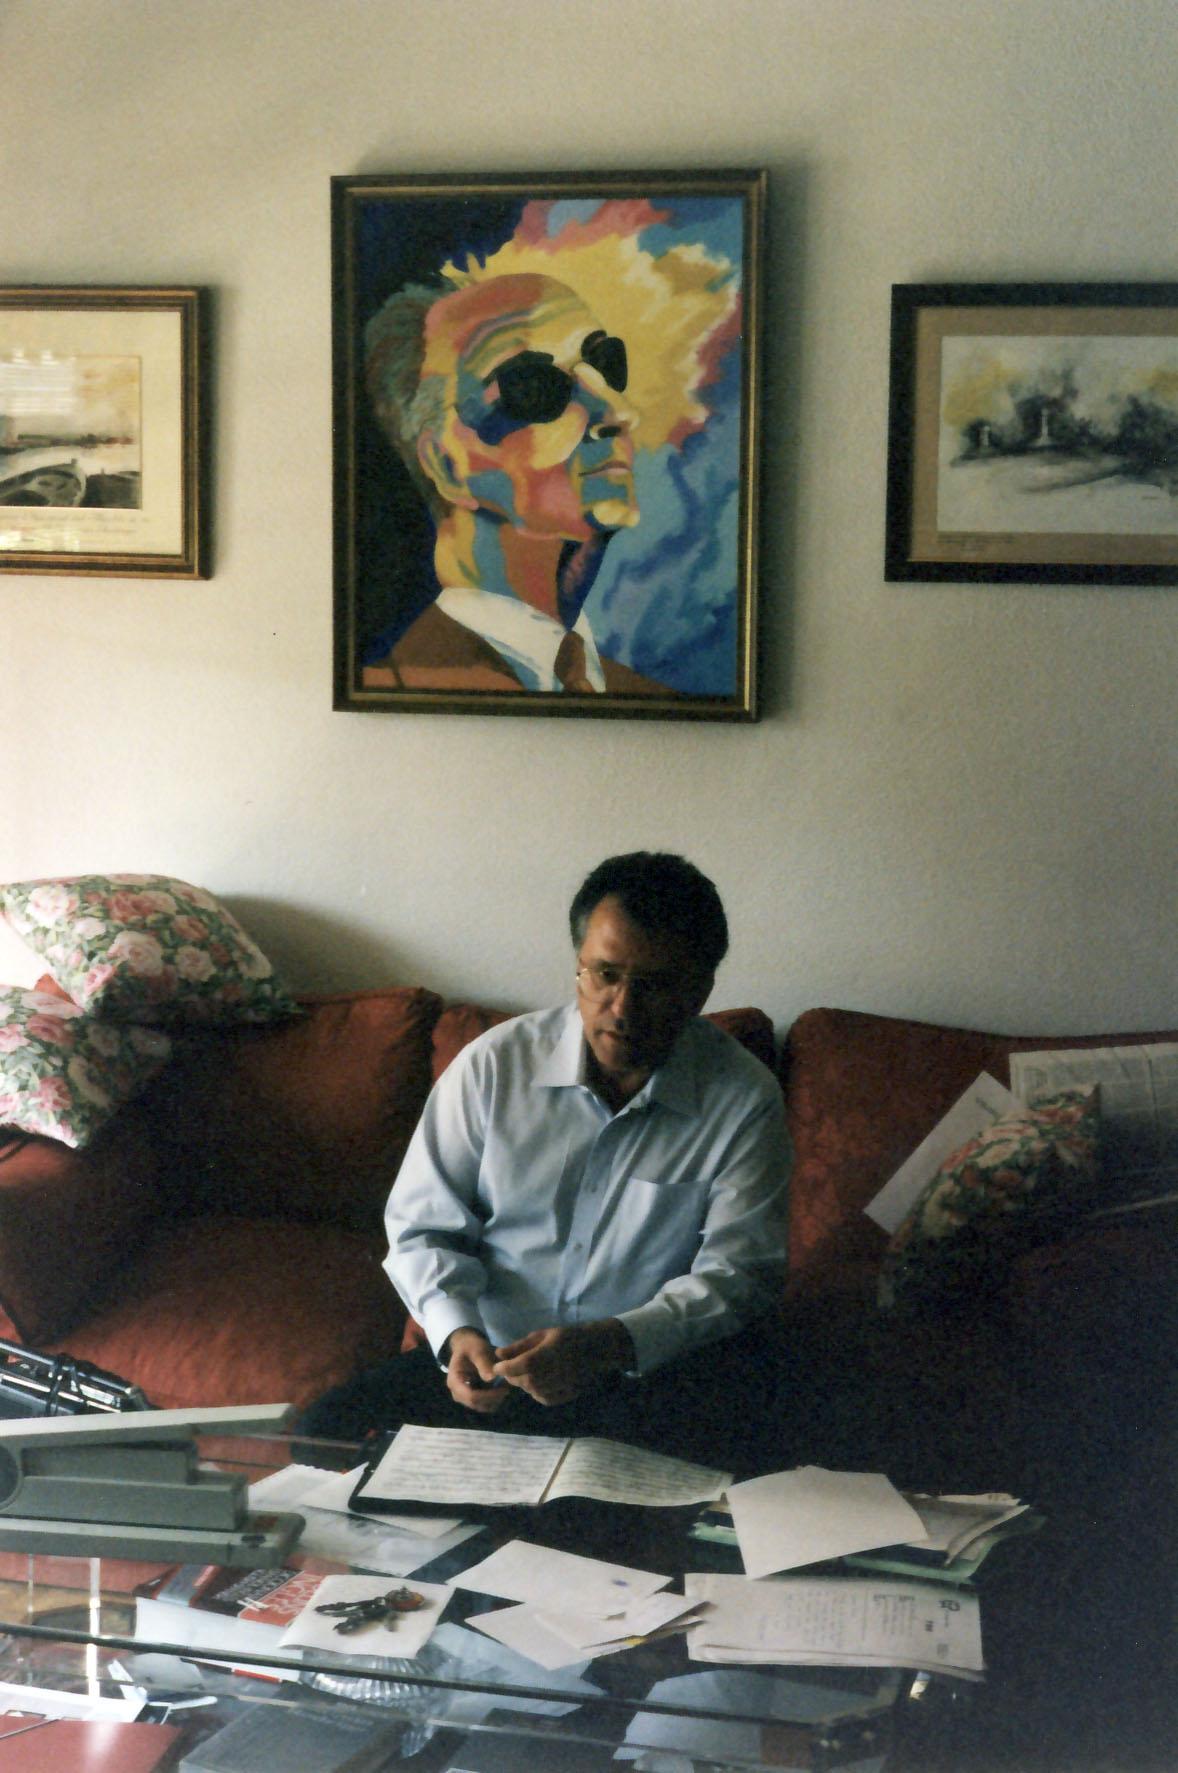 Editing ¨Invocacion y danza¨ in Rodrigo's home